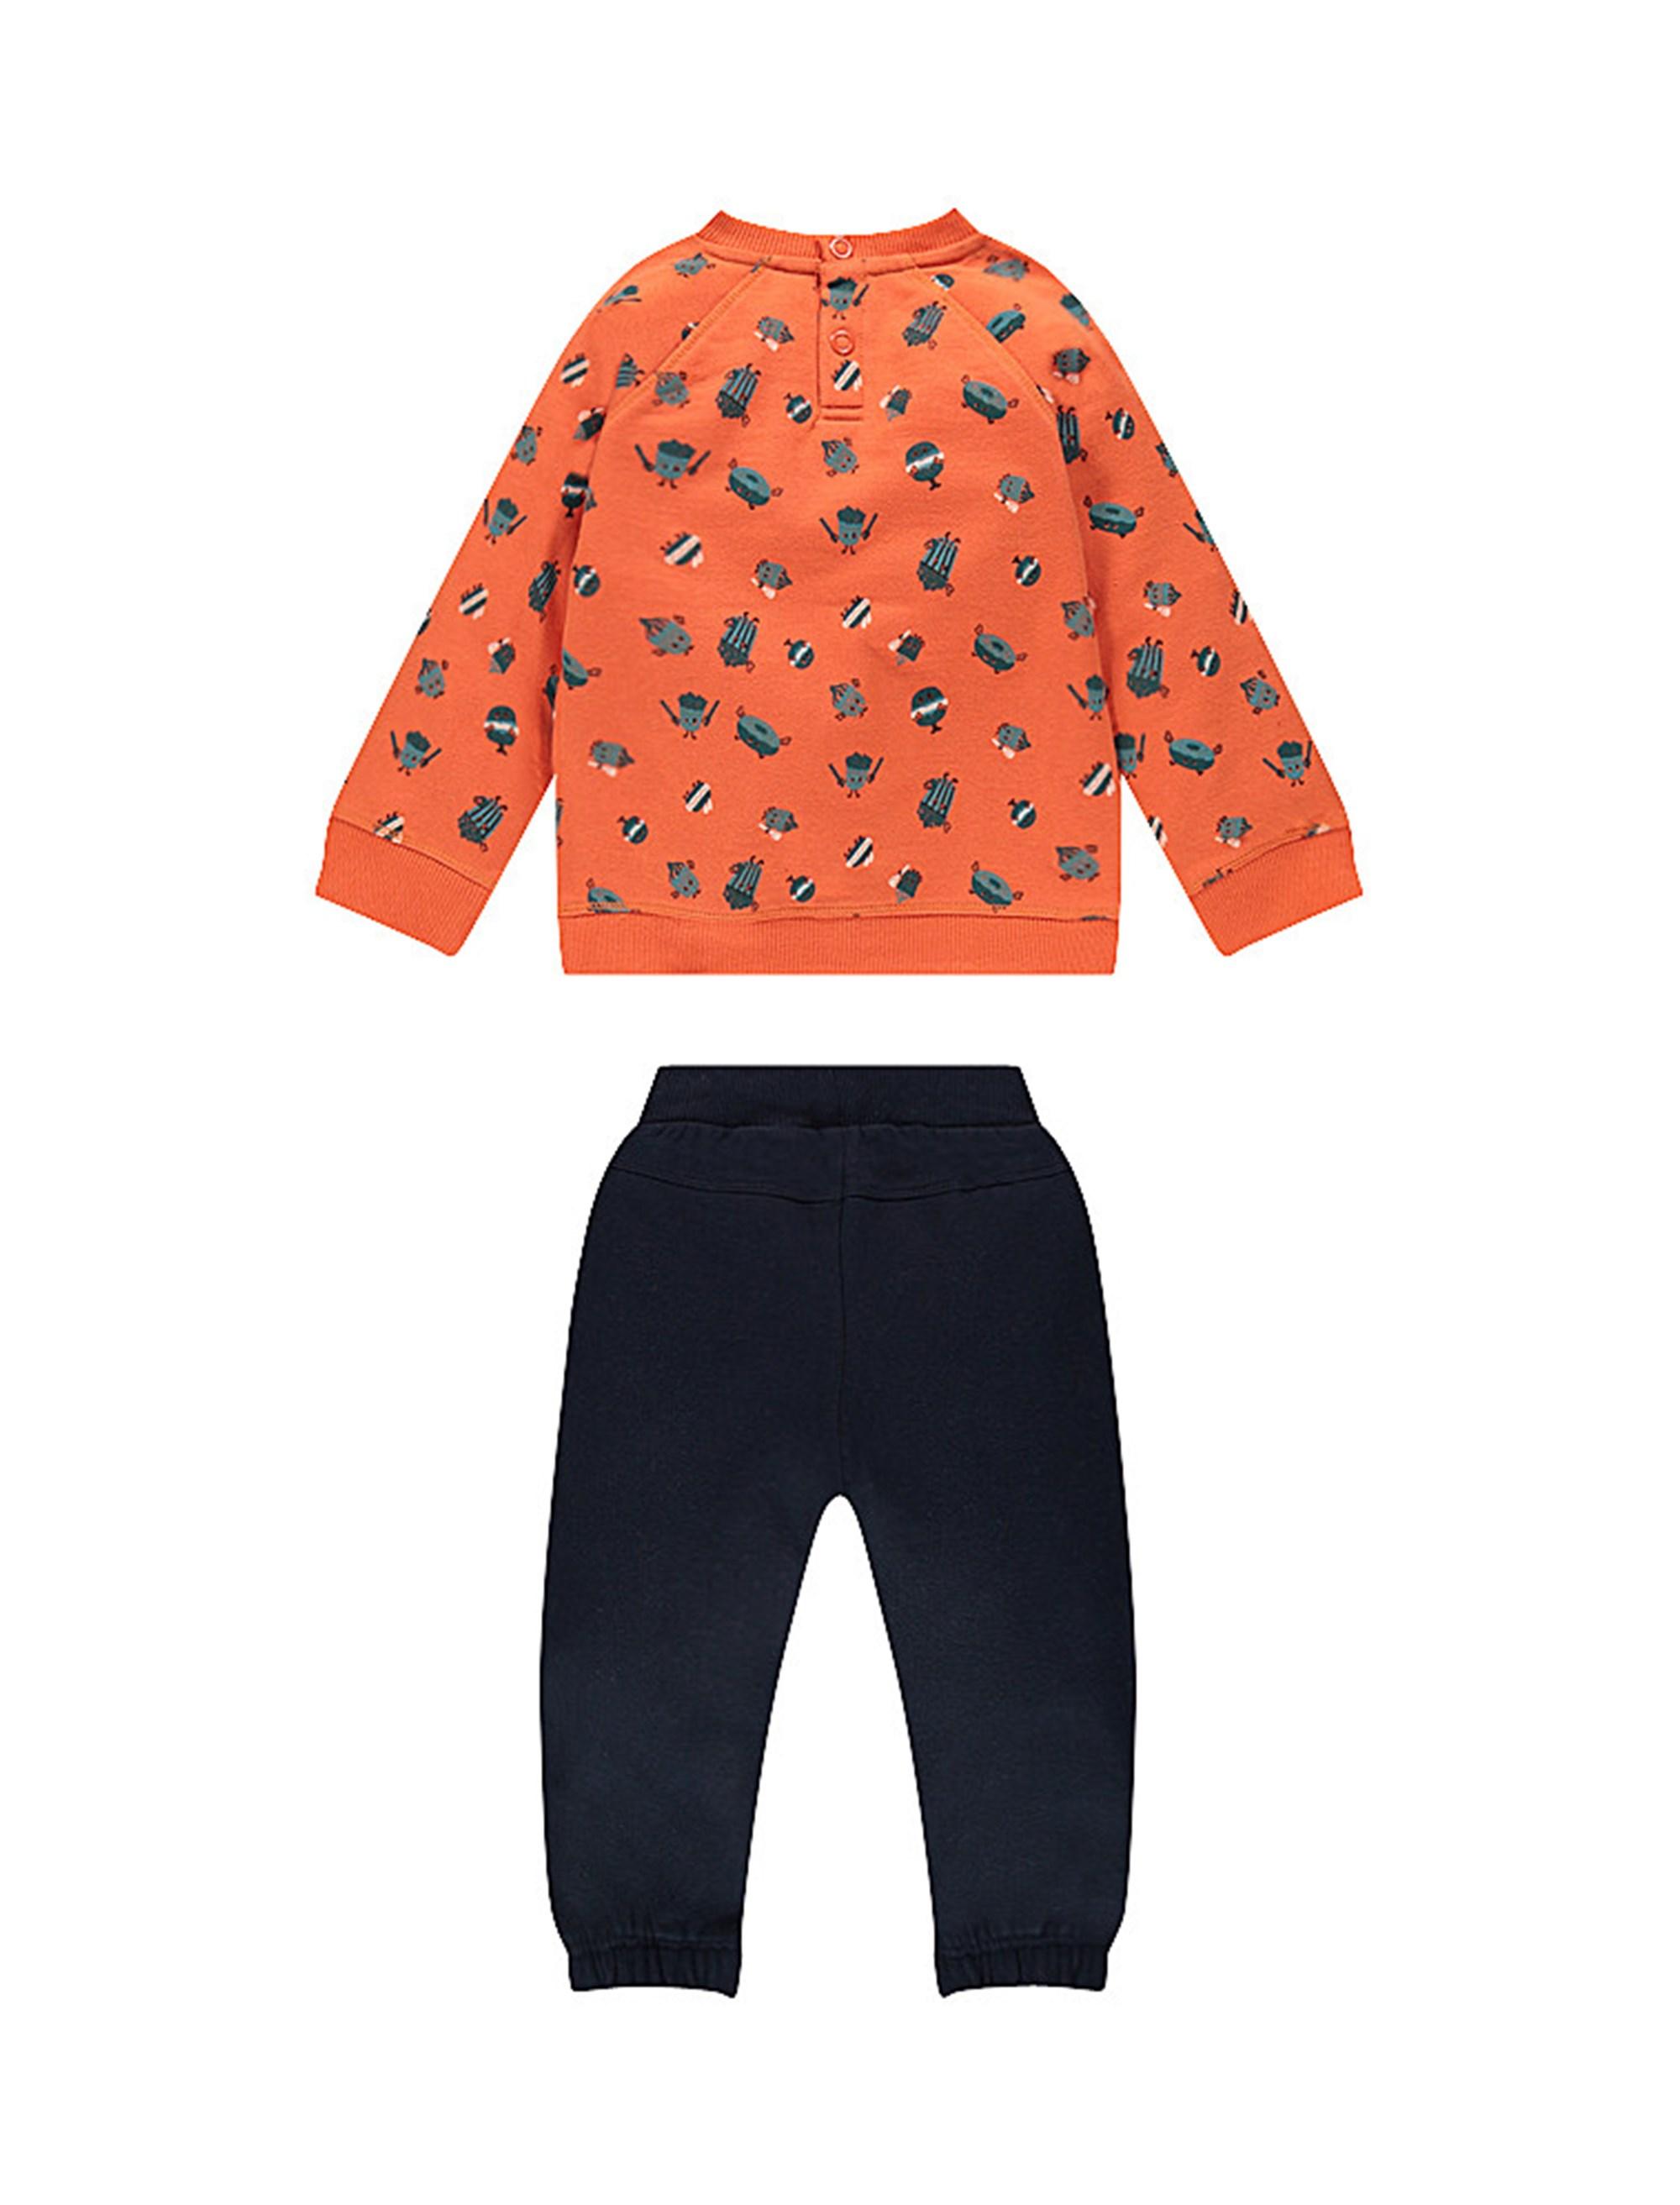 سویشرت و شلوار نخی دم پا کش نوزادی پسرانه - ارکسترا - سرمه اي و نارنجي - 2